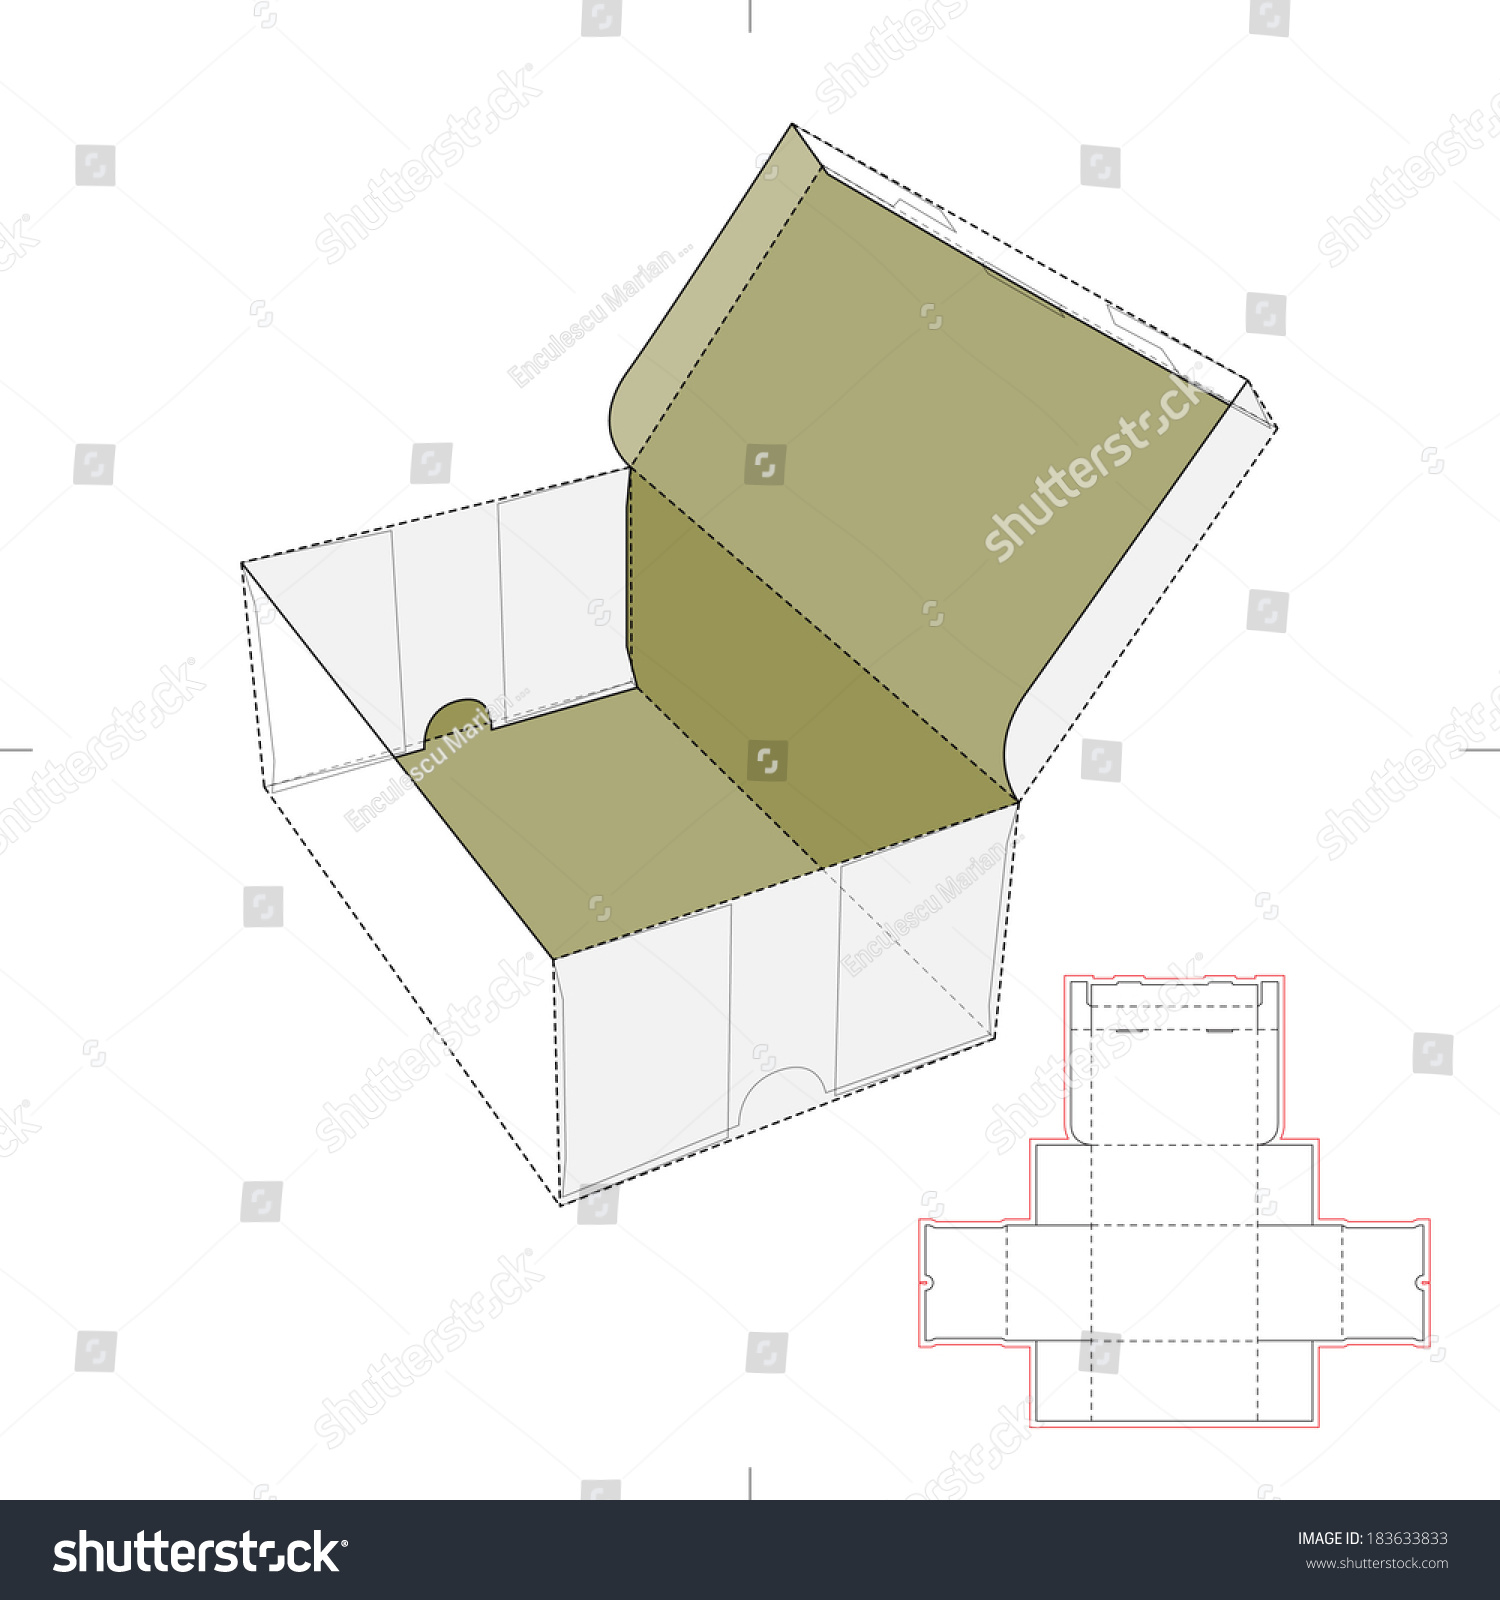 shoe box diecut pattern stock vector royalty free 183633833